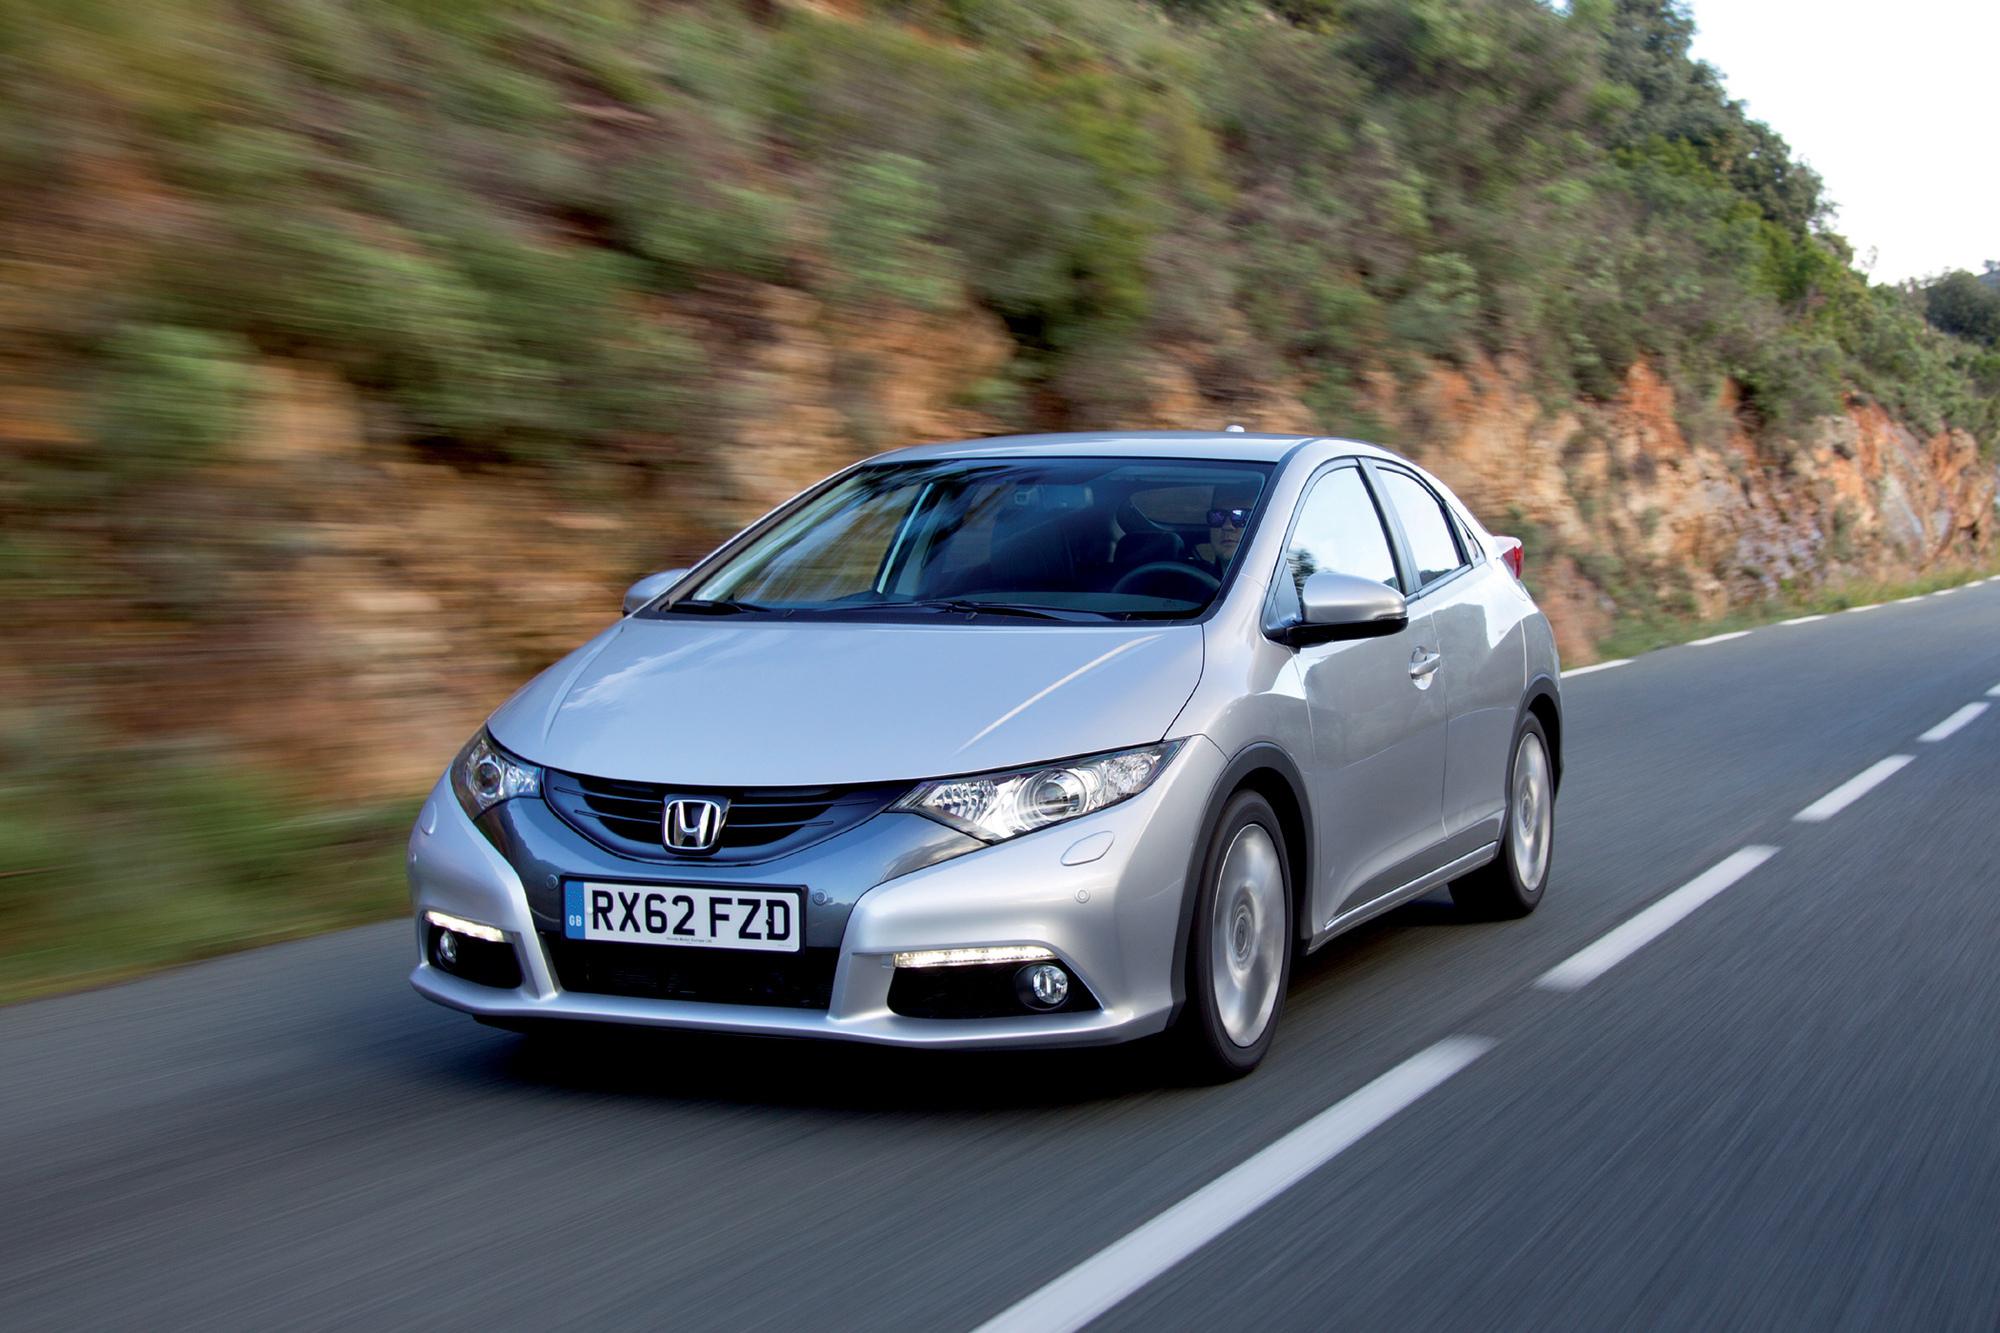 Test: Honda Civic 1.6i-DTEC - Einmal nur den Motor, bitte